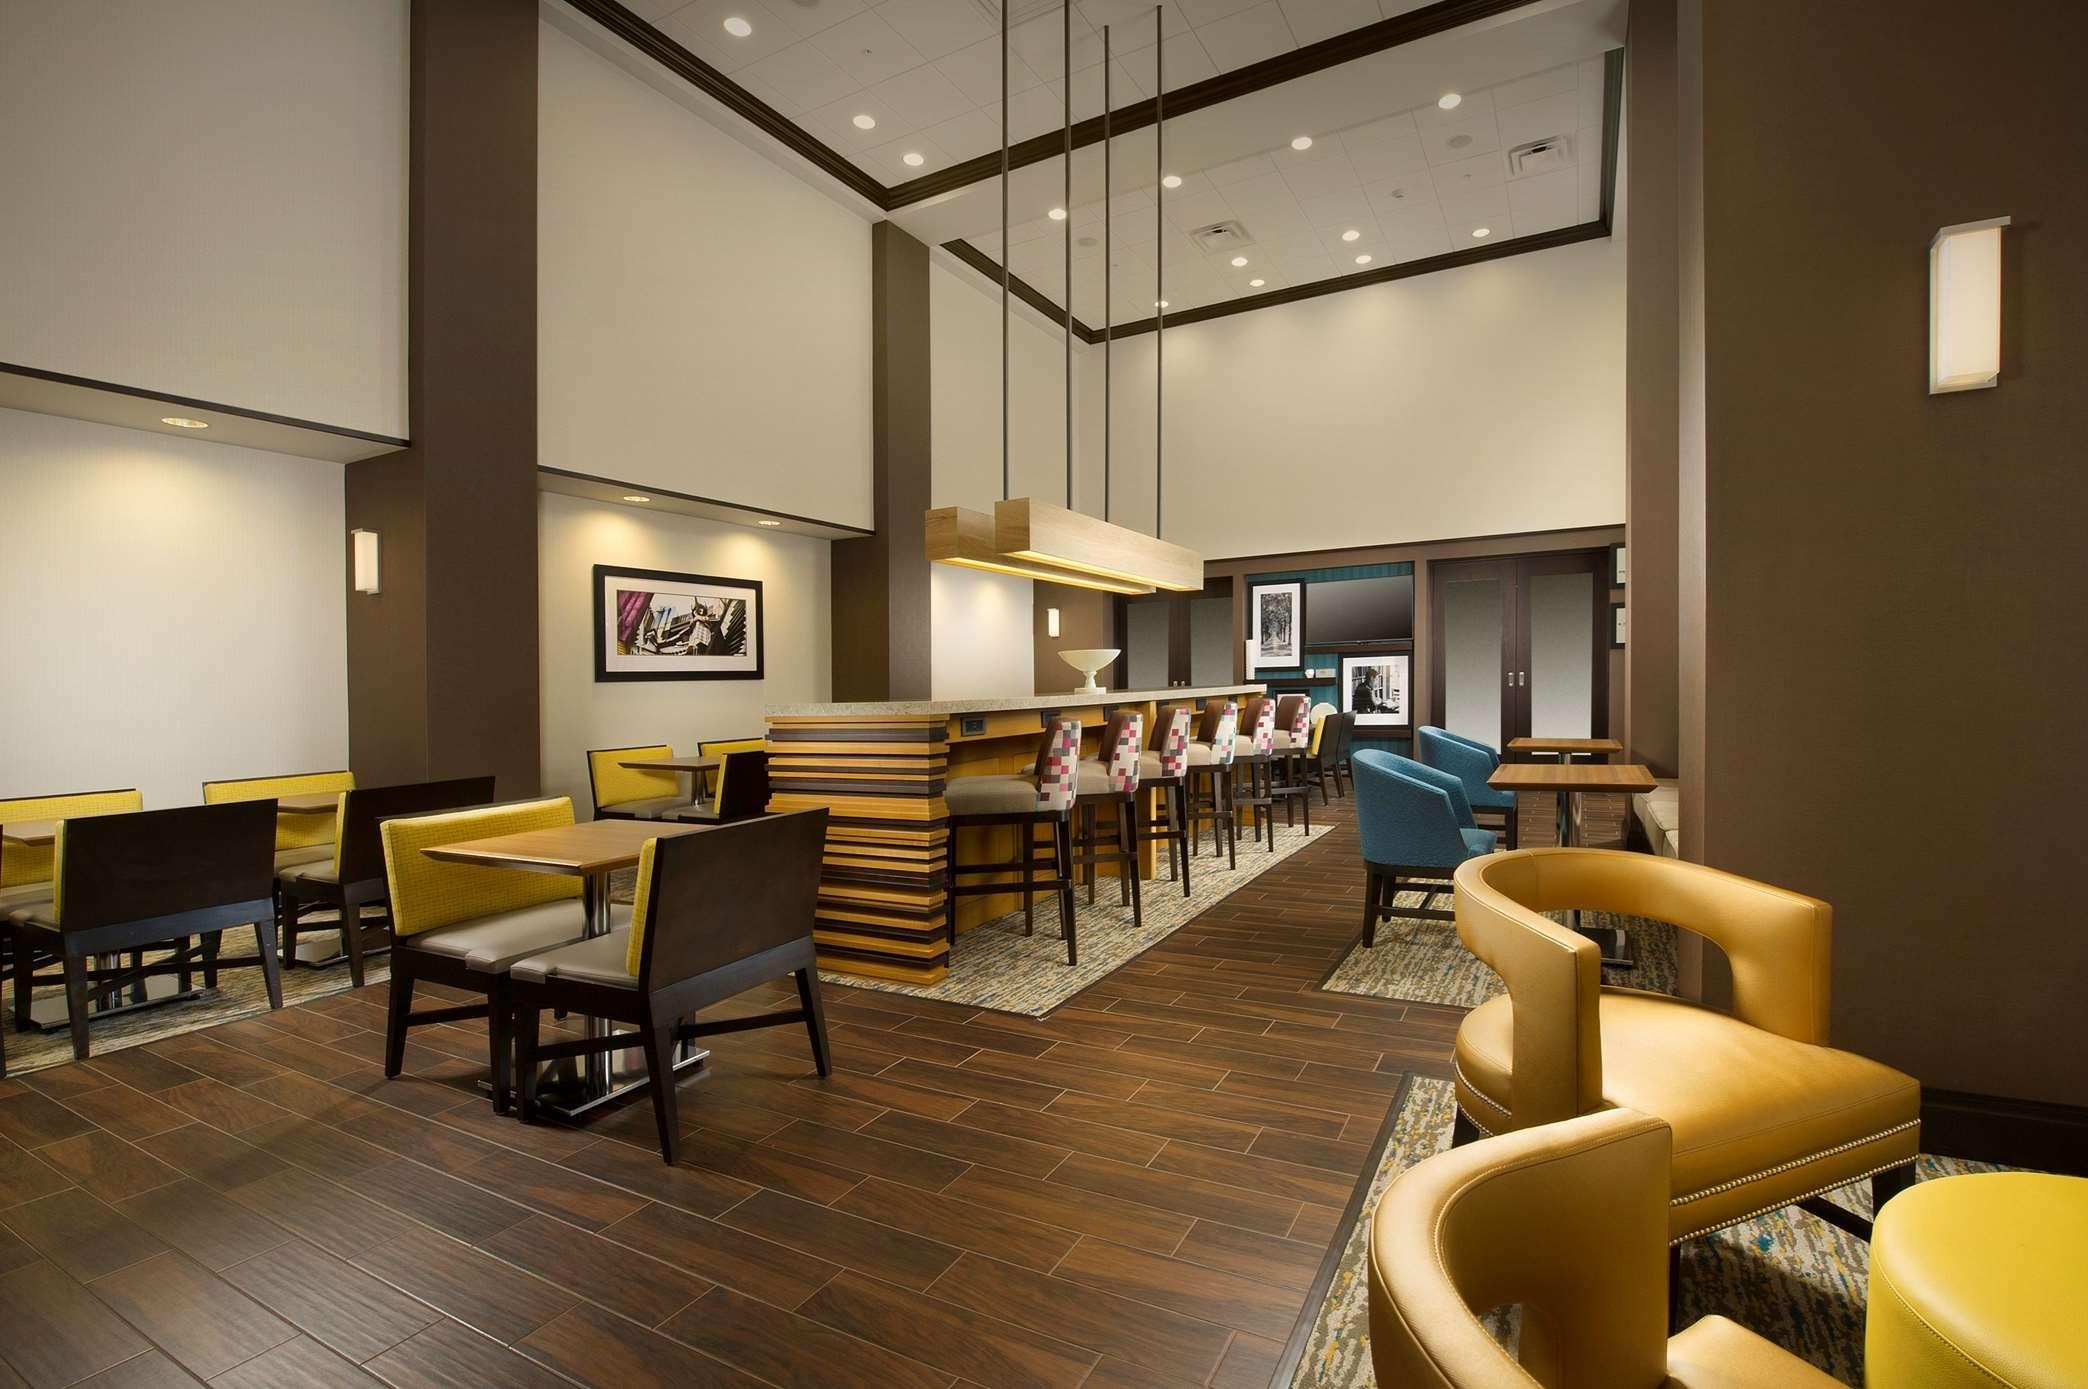 Hampton Inn & Suites Syracuse/Carrier Circle image 3